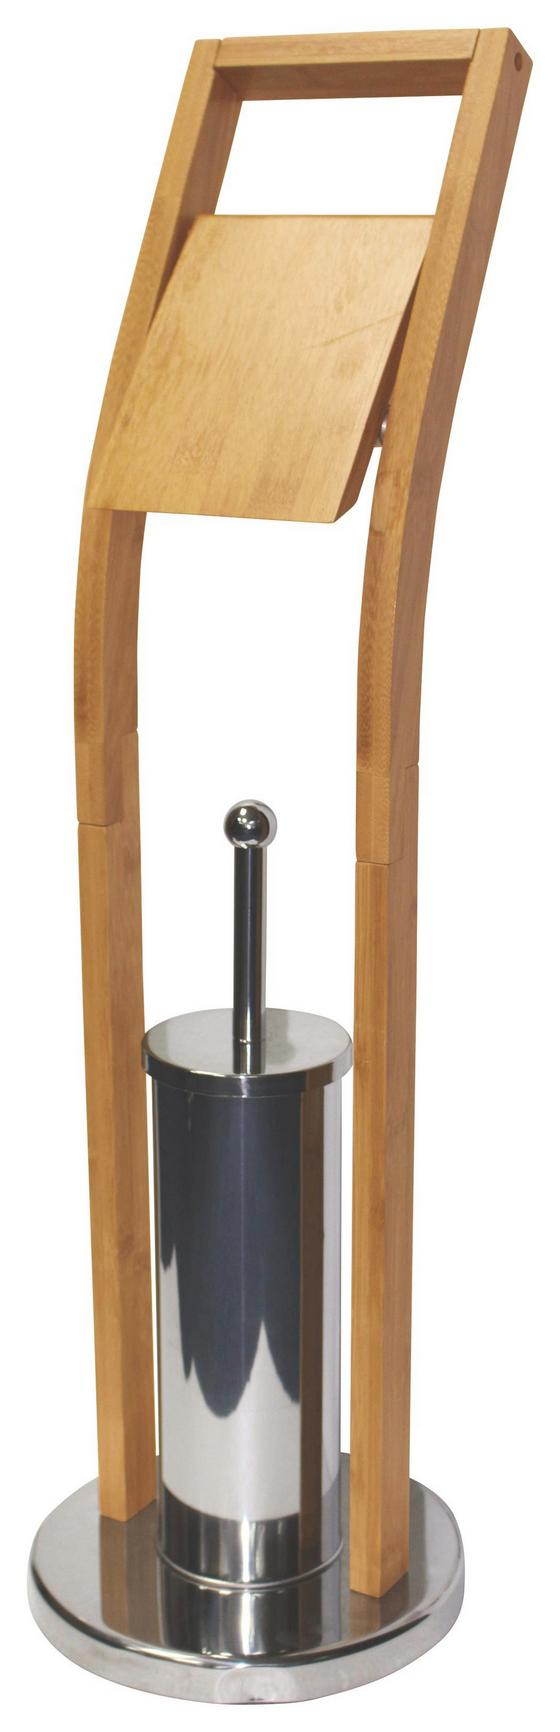 WC-Bürstenhalter Nancy - Chromfarben/Naturfarben, MODERN, Holz/Kunststoff (22/75/22cm) - Homezone